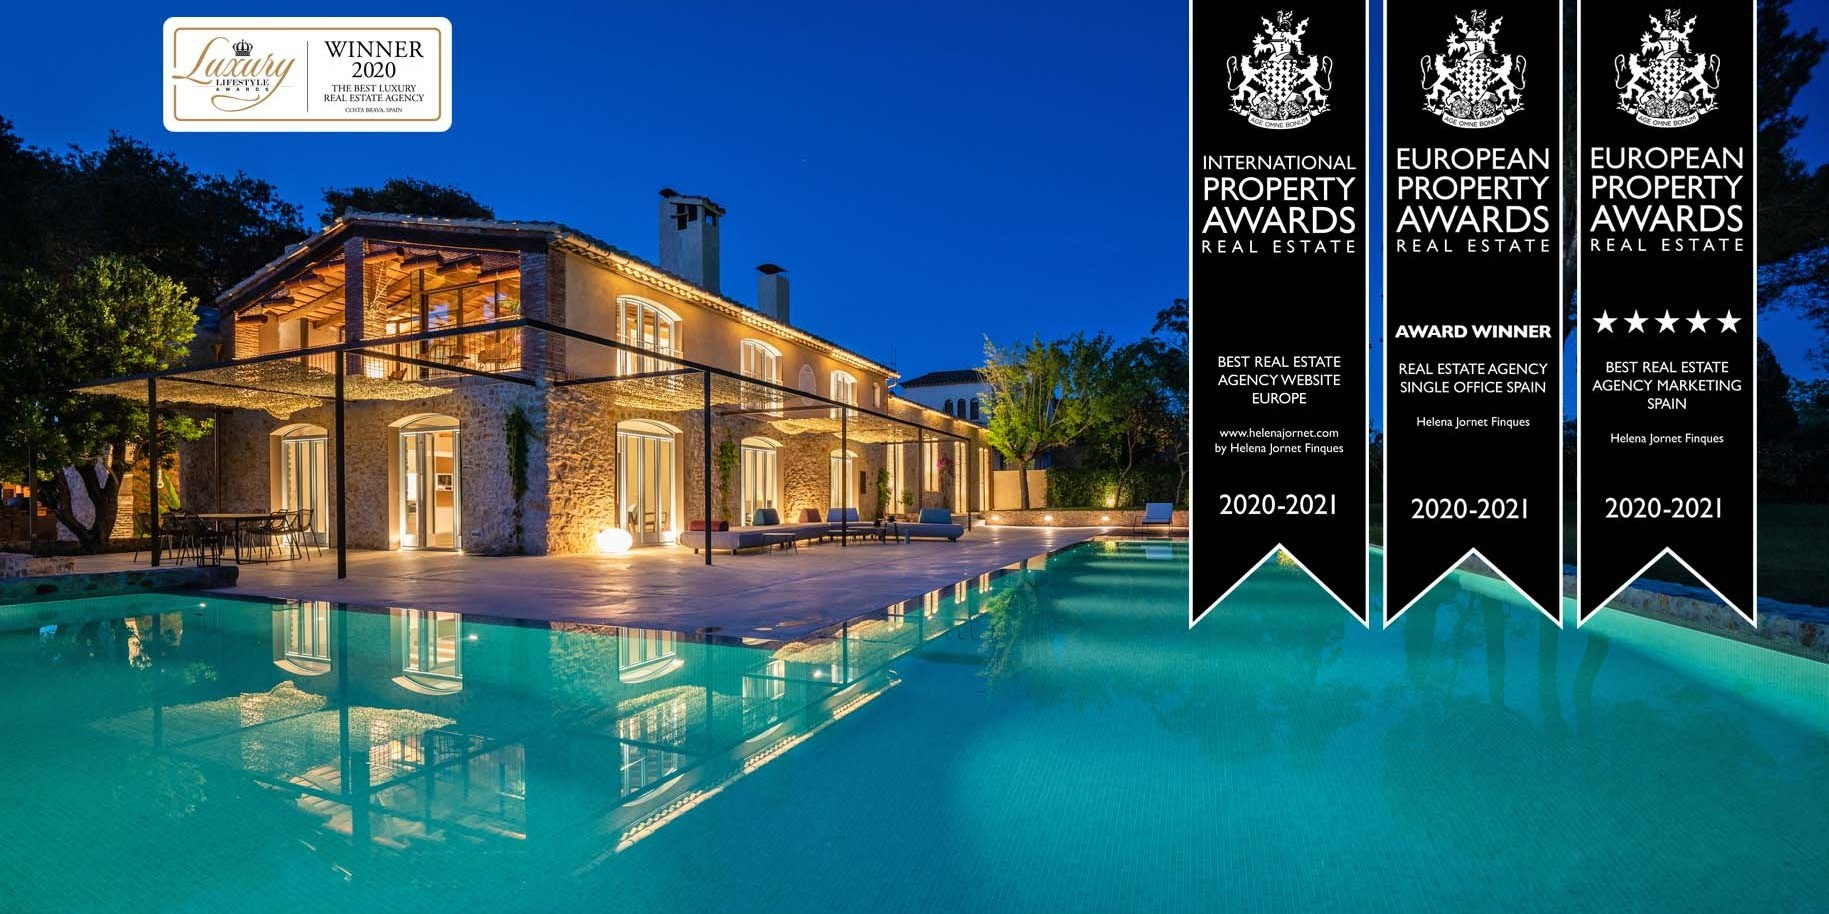 Helena Jornet Finques best real estate Costa Brava